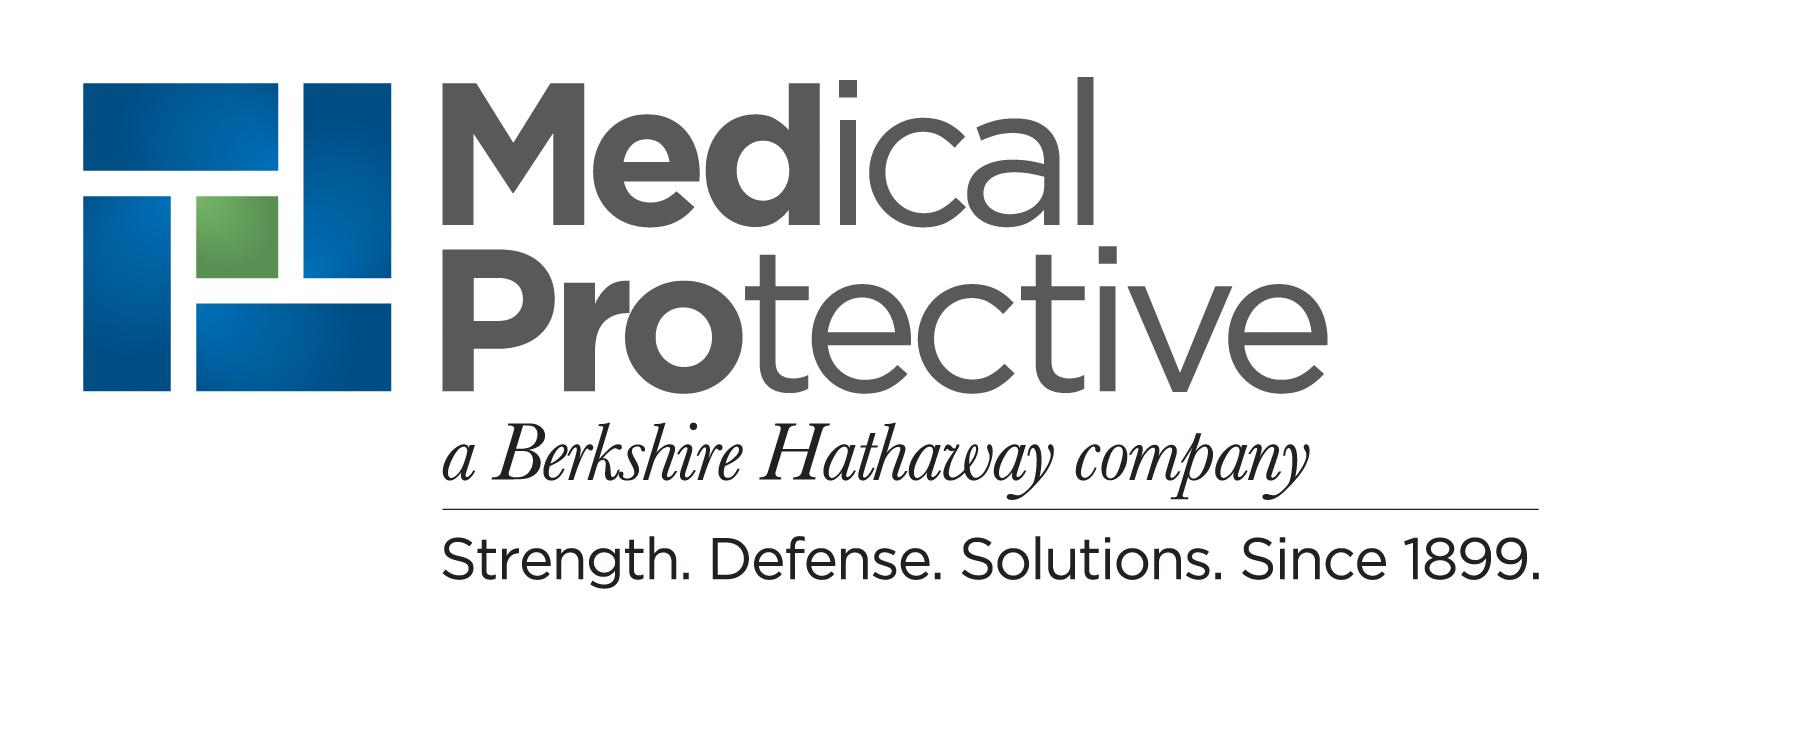 Medical Protective Company